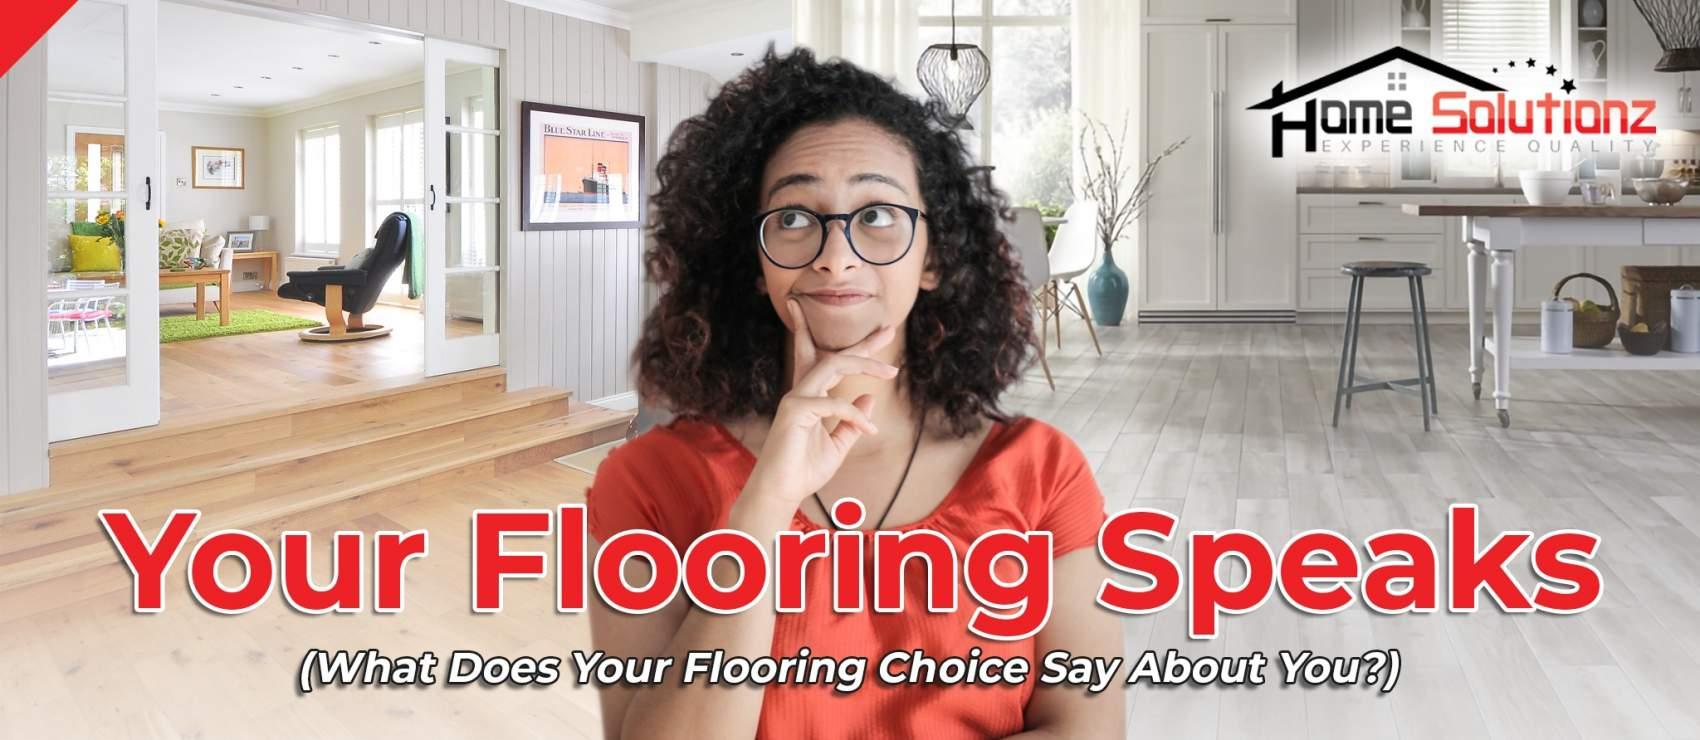 Your Flooring Speaks